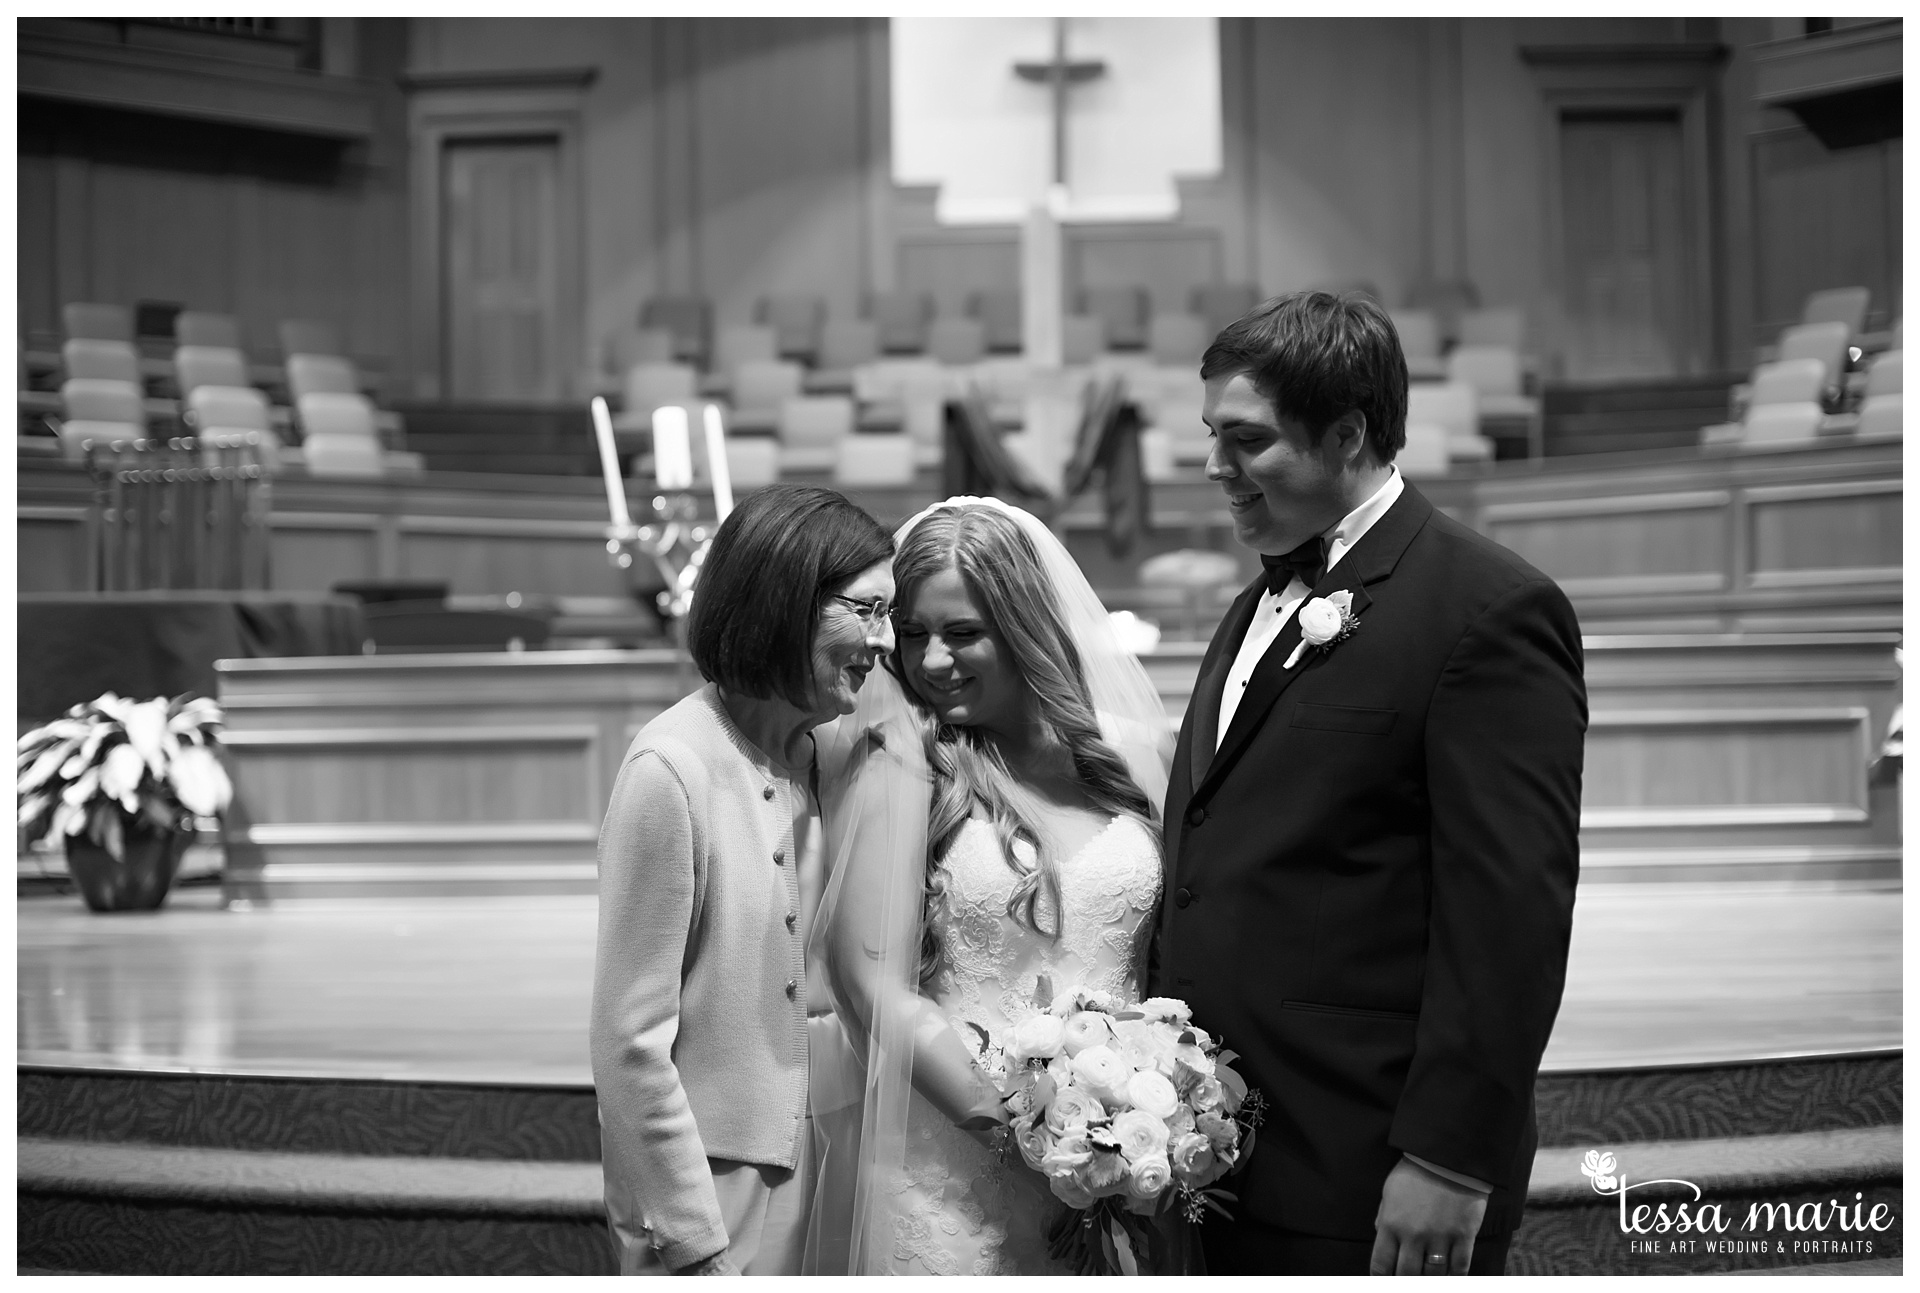 tessa_marie_weddings_legacy_story_focused_wedding_pictures_atlanta_wedding_photographer_0127